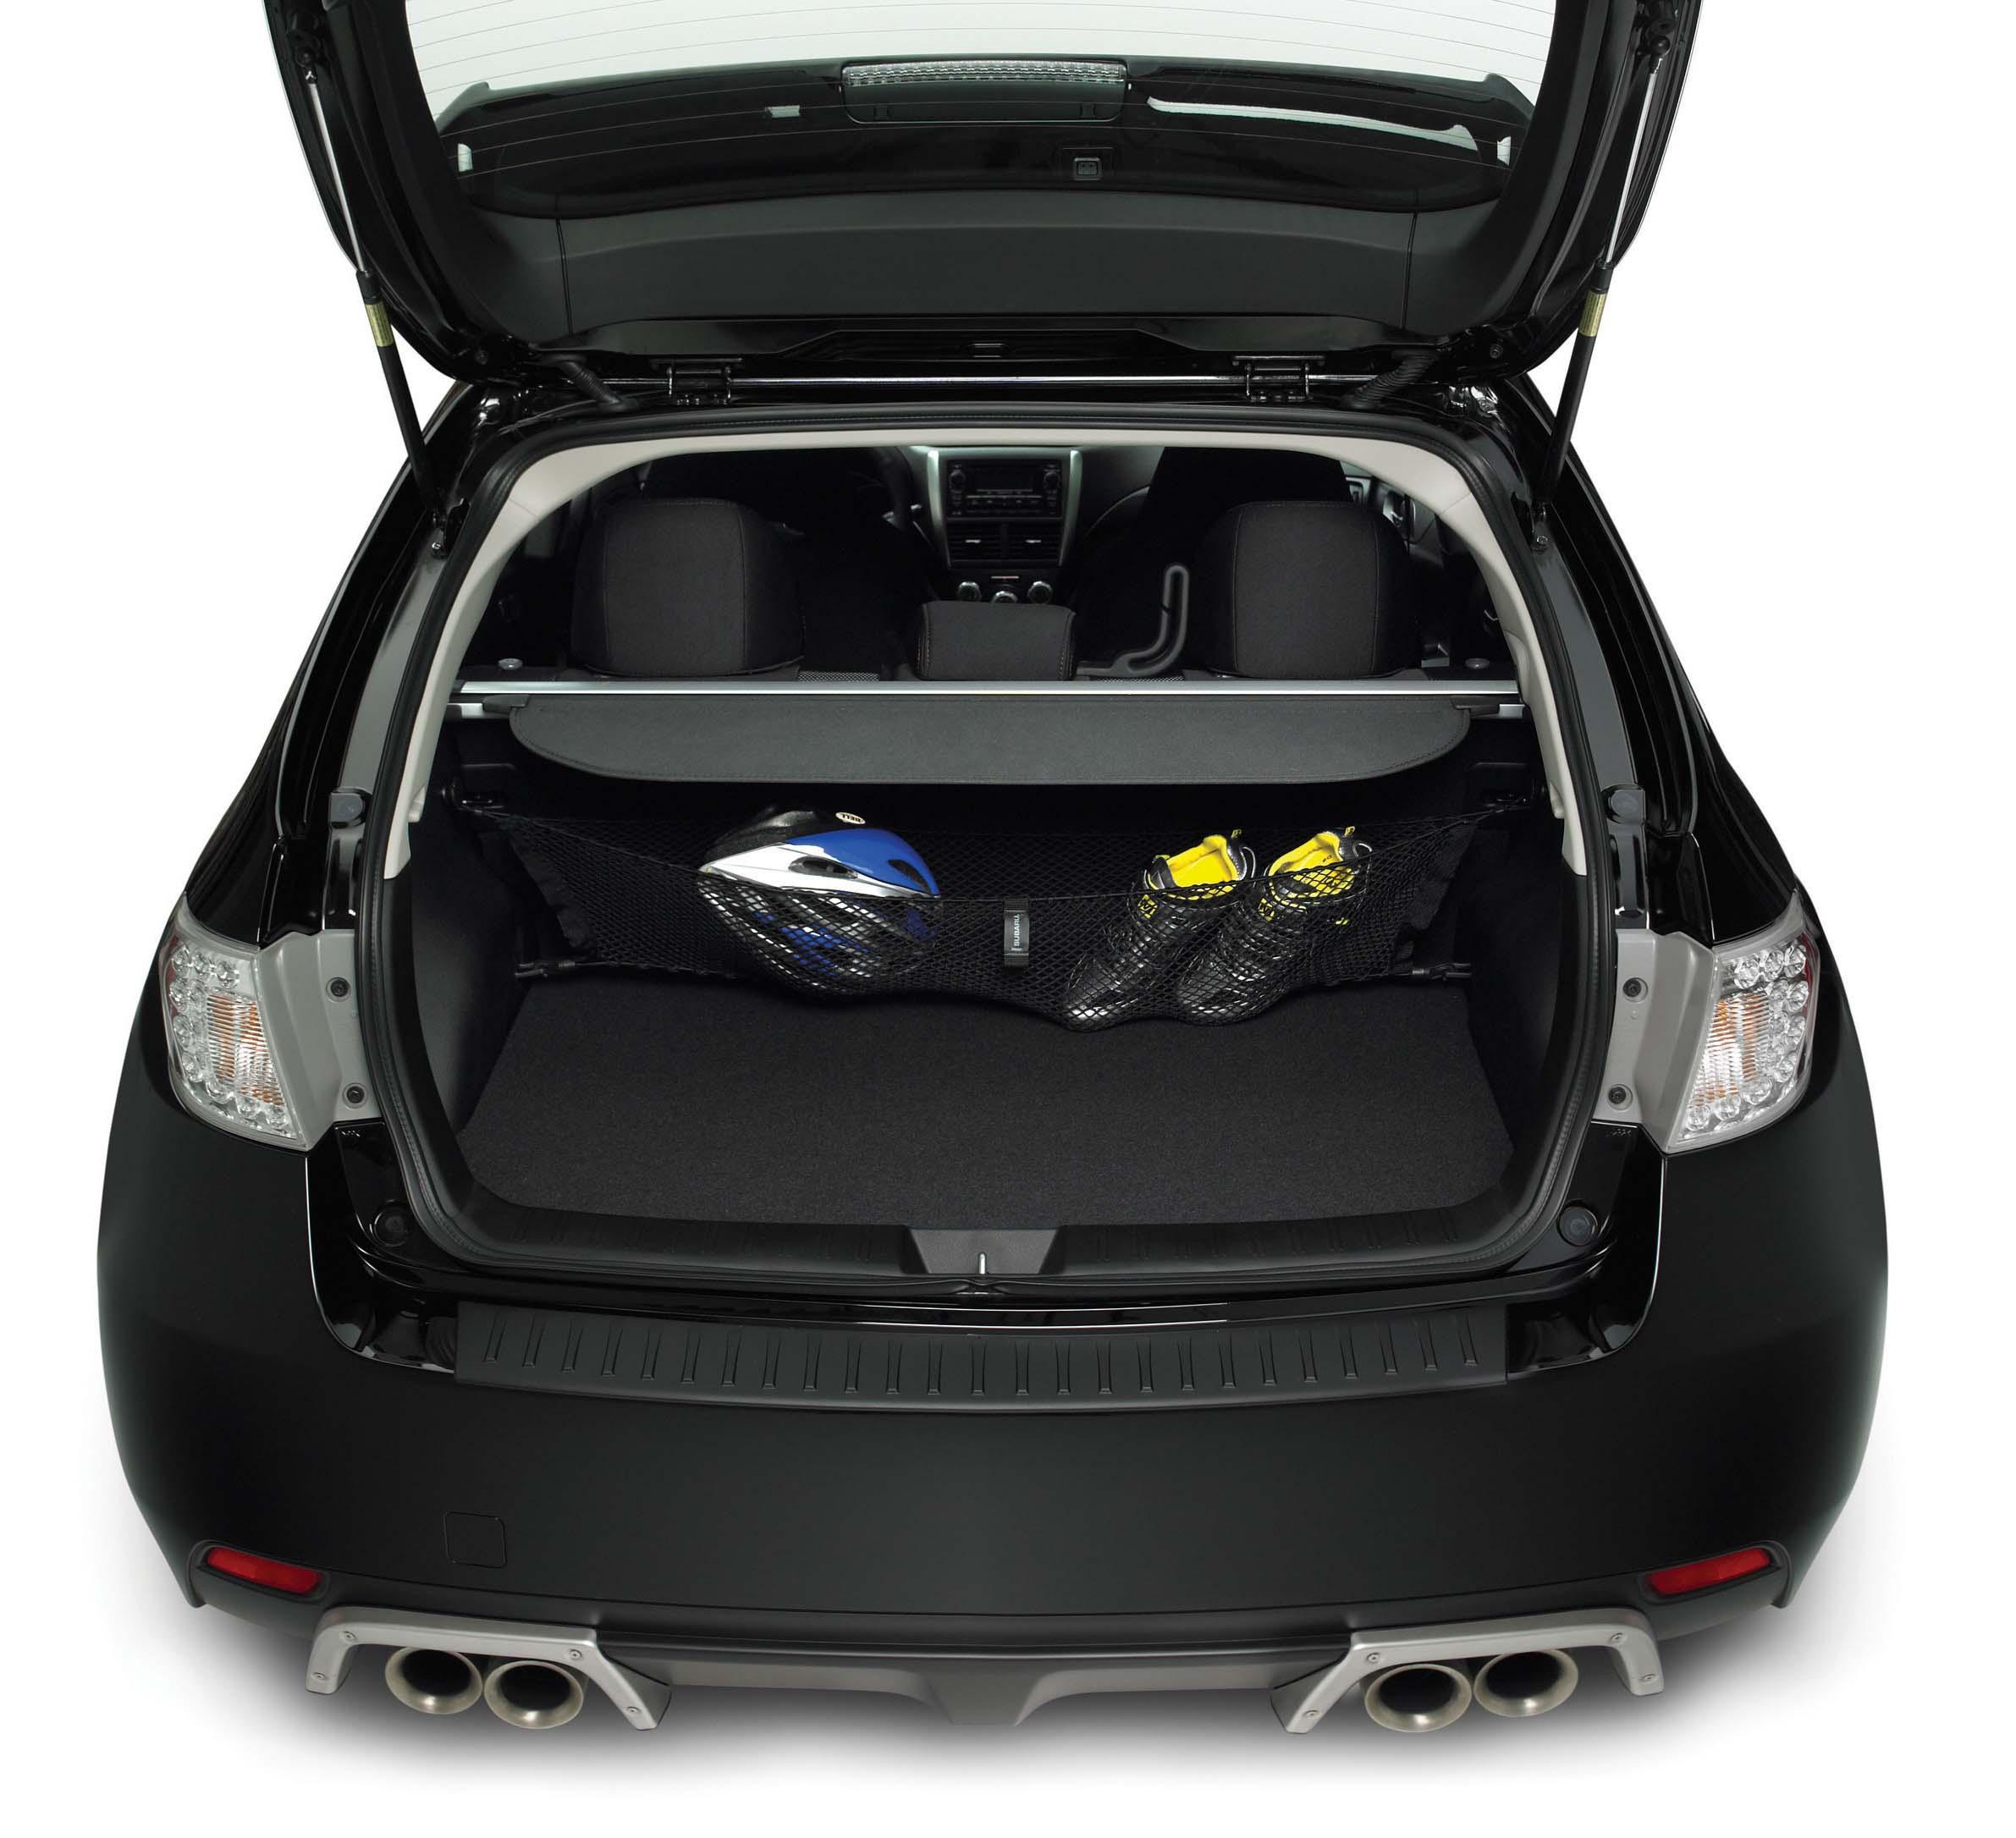 Toyota Superstore Hartford Ct: 2011 Subaru Impreza Cargo Net